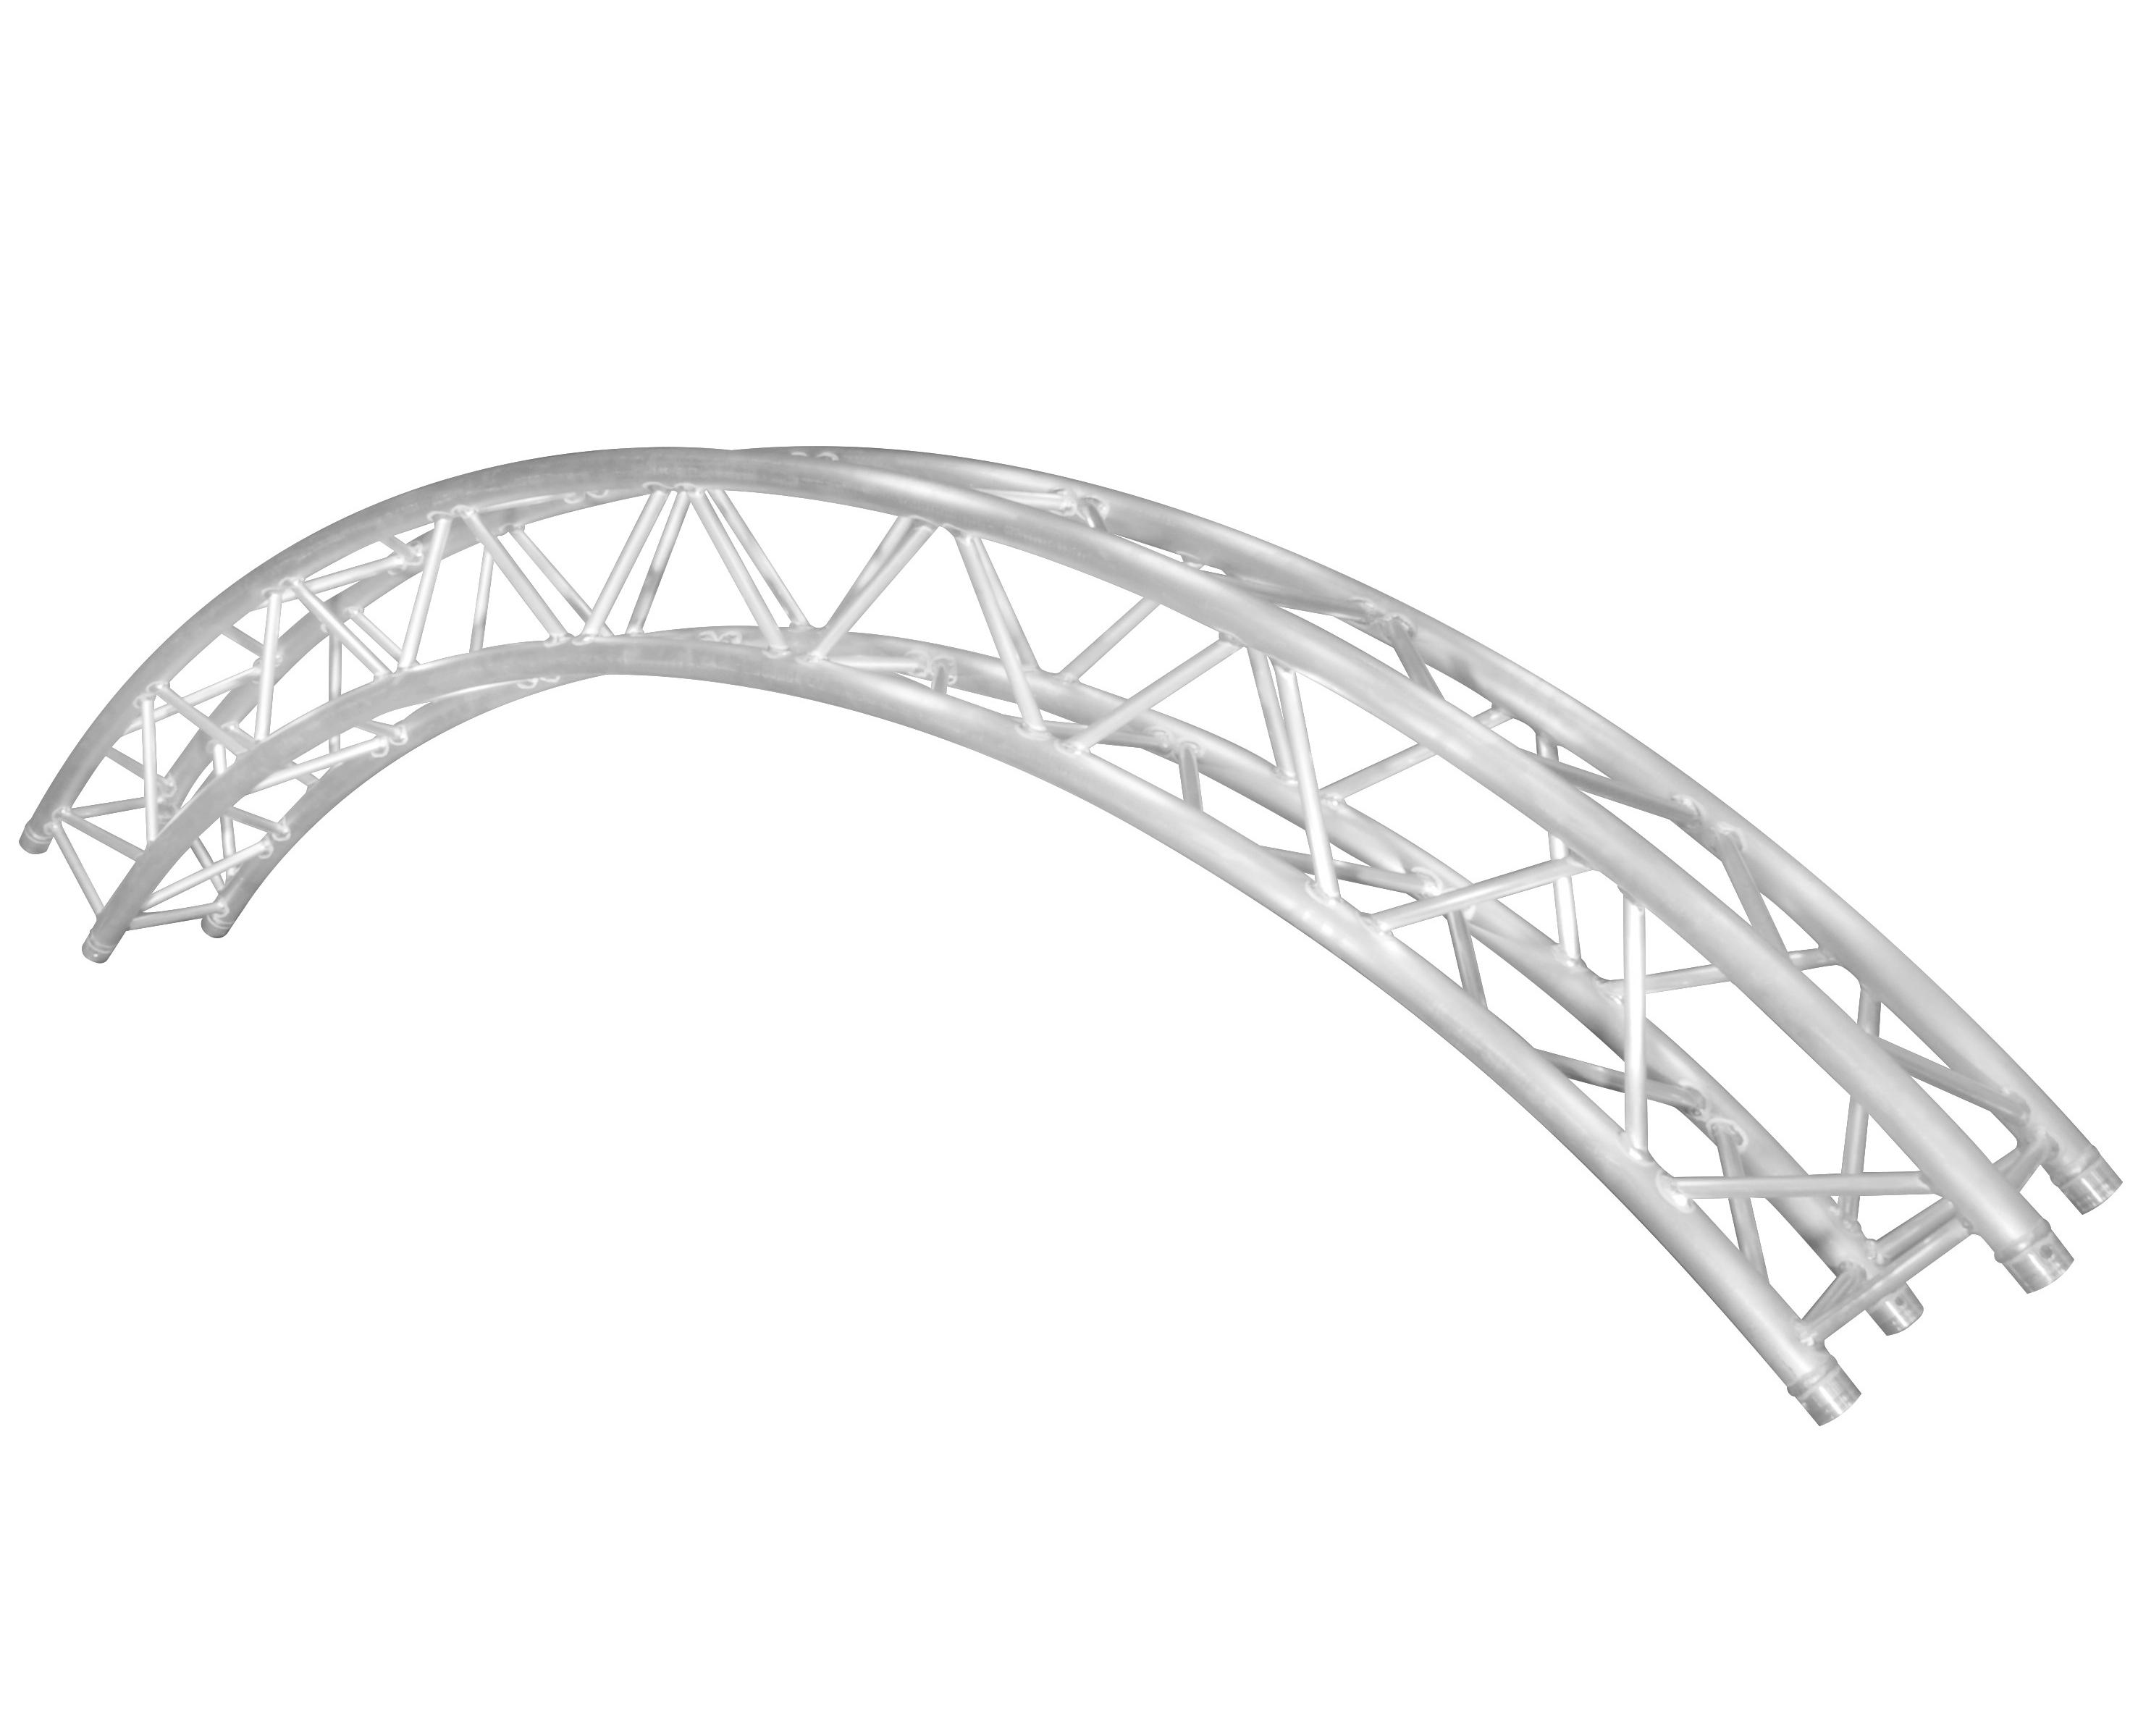 ilumenatrix 10ft circle truss   guaranteed lowest price